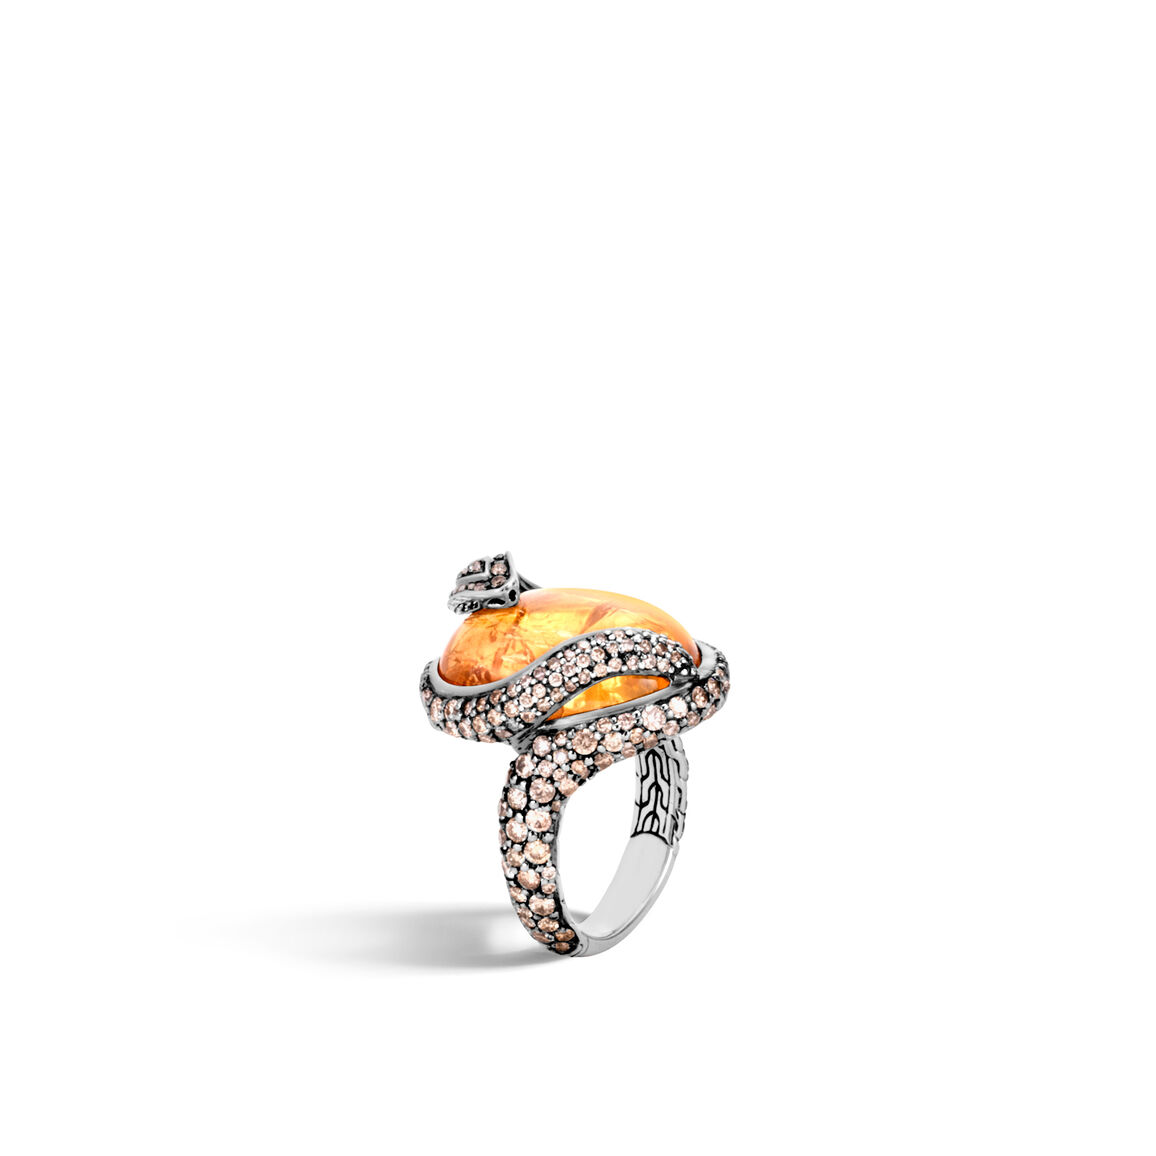 Legends Cobra Ring in Silver with 20x15MM Gemstone, Diamonds